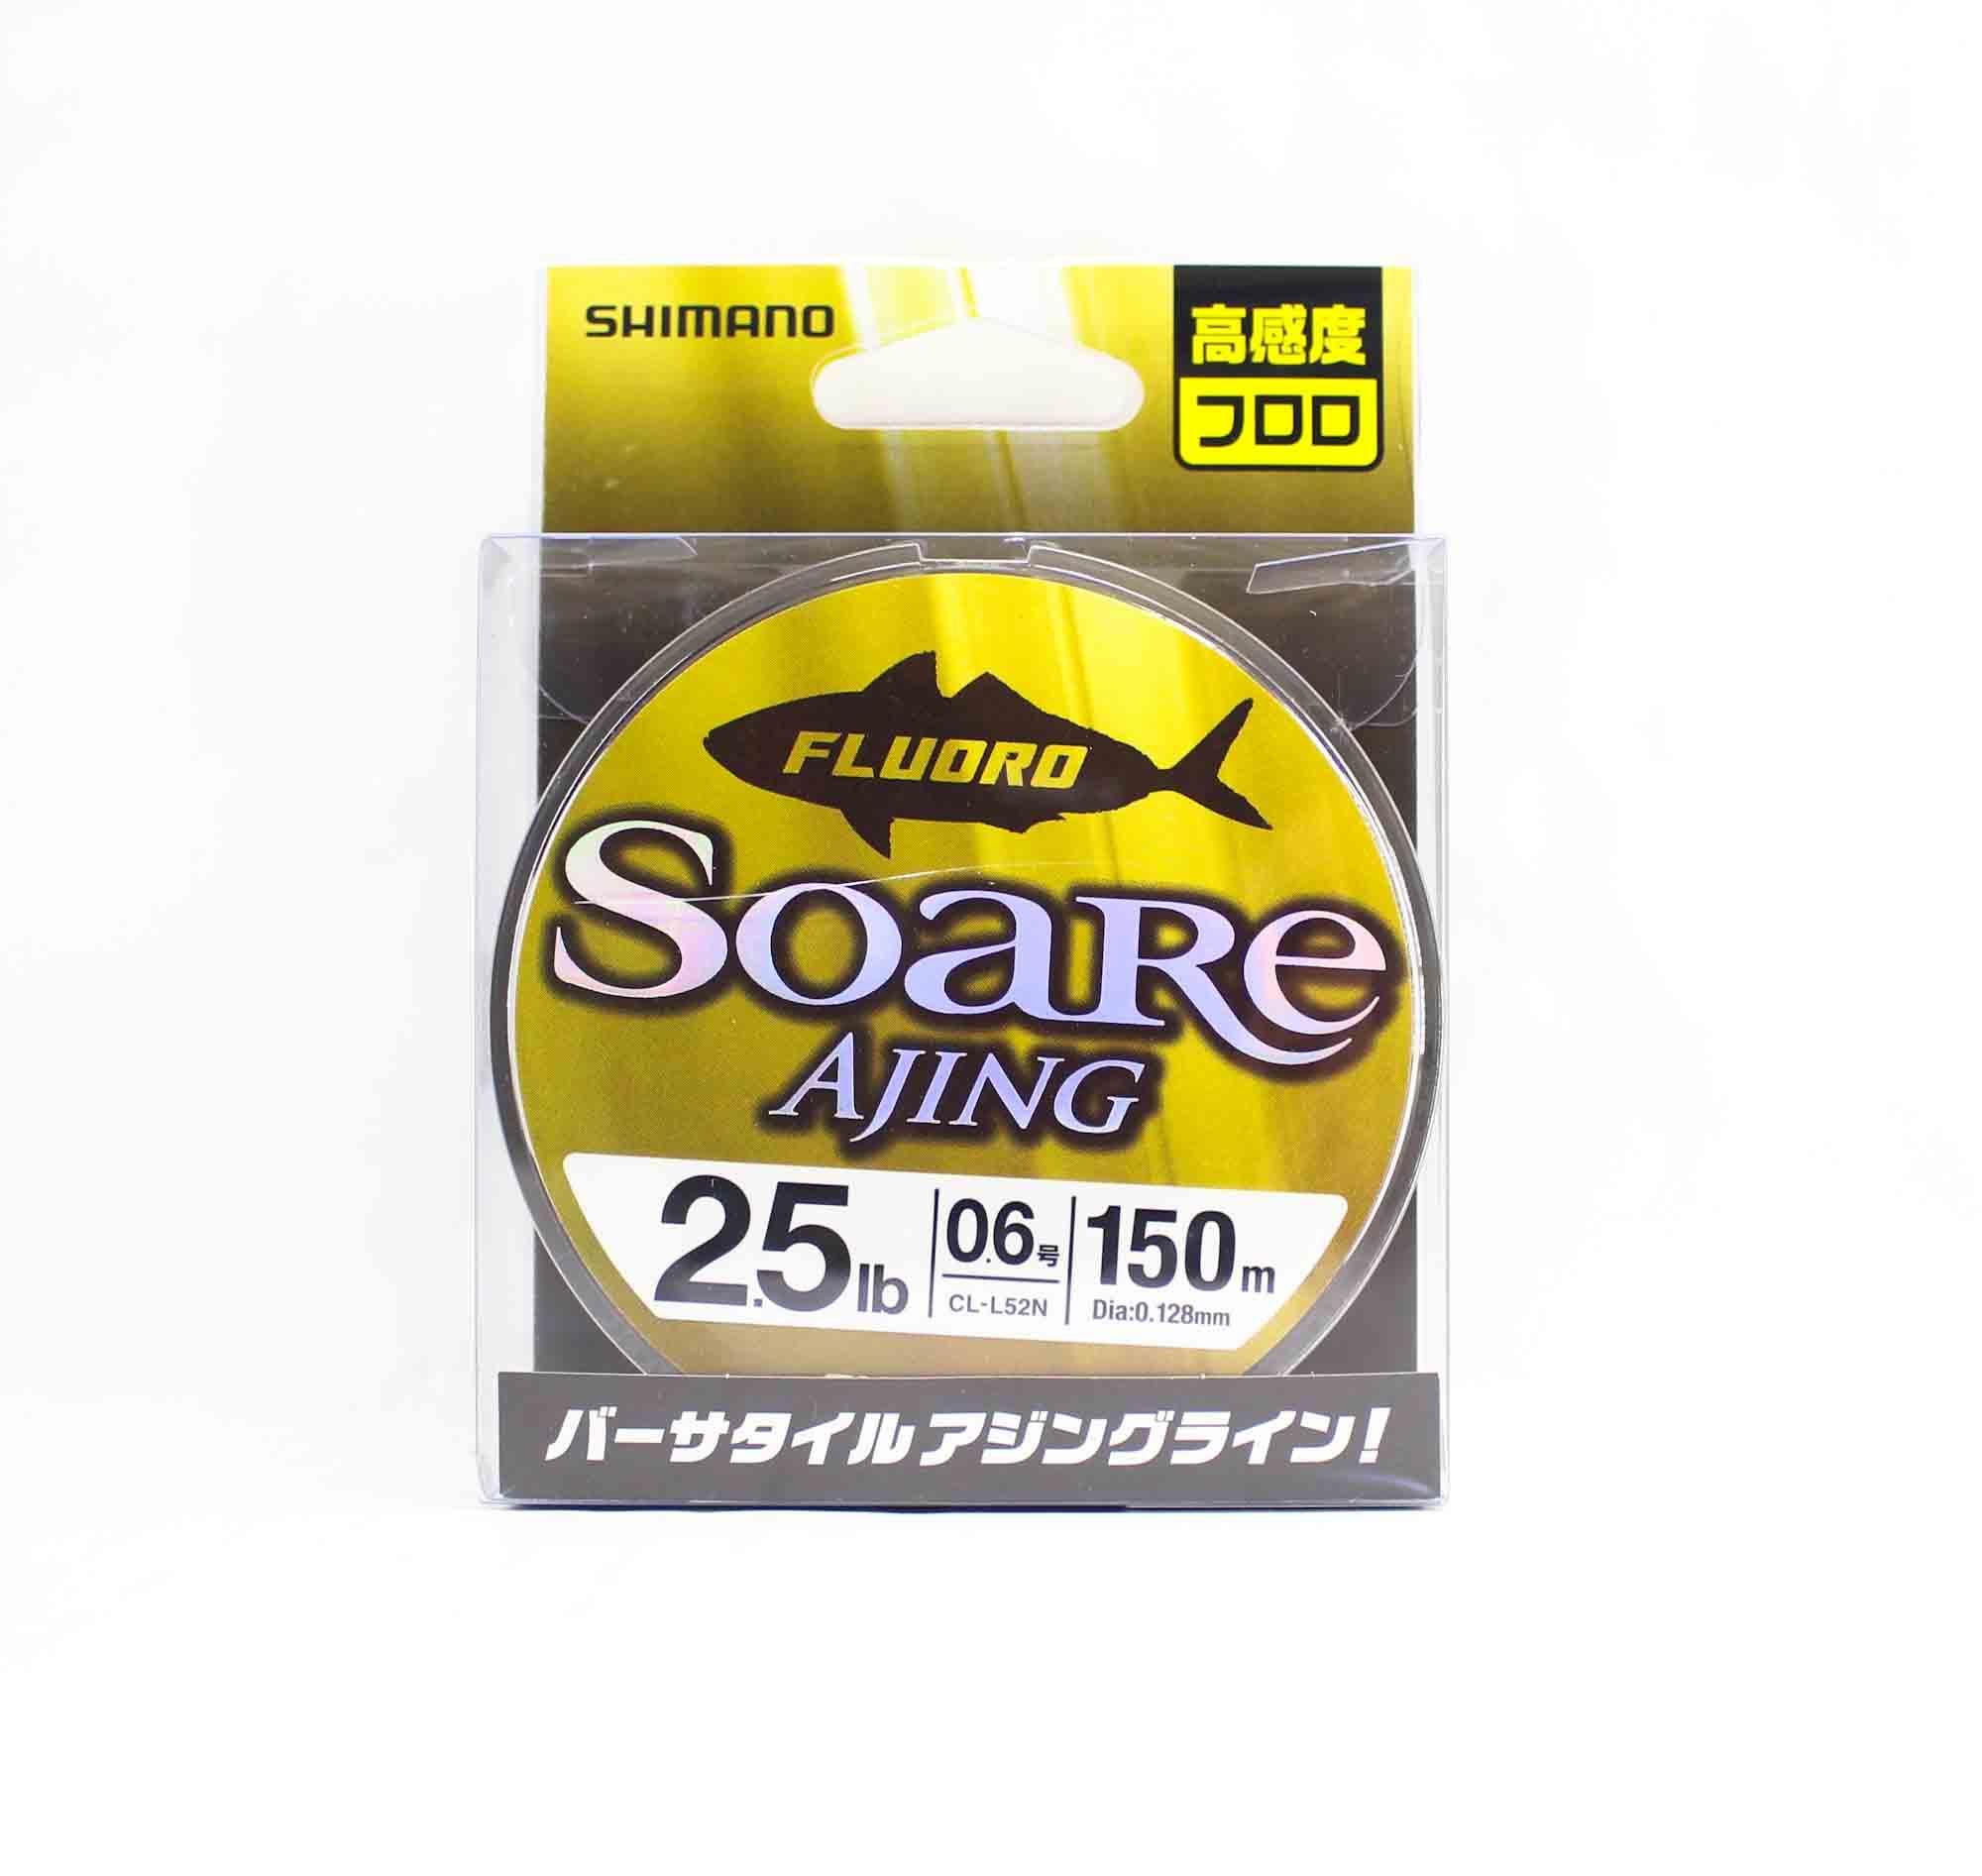 Shimano CL-52N Soare Ajing Fluorocarbon Line 150m Size 0.6 2.5lb 442628